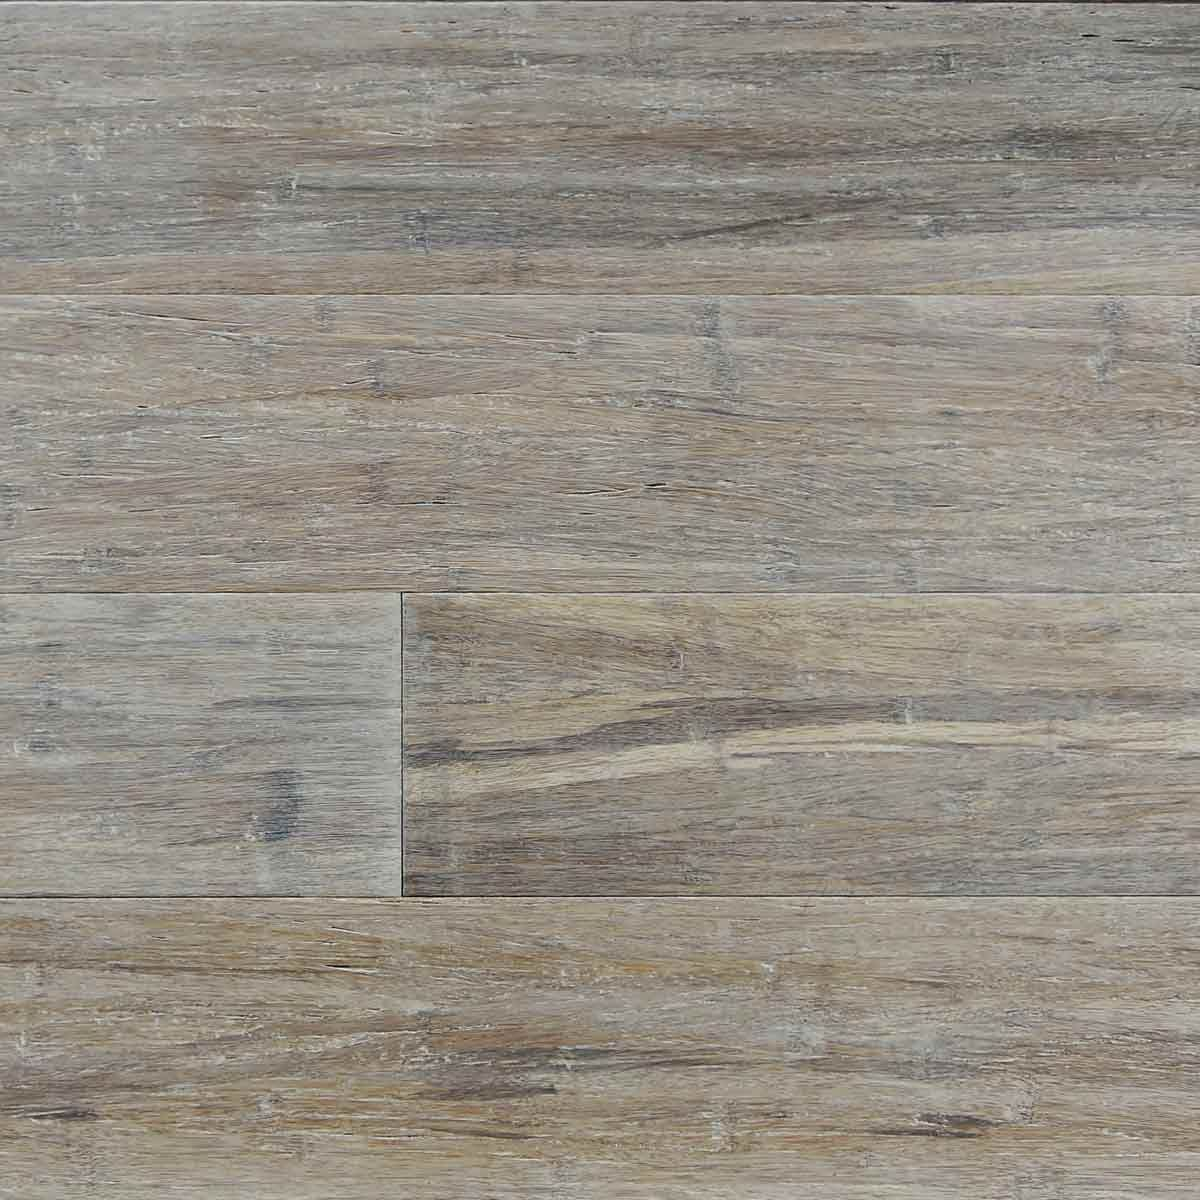 Perth Focus On Flooring Bamboo Beach House Beach House Flooring